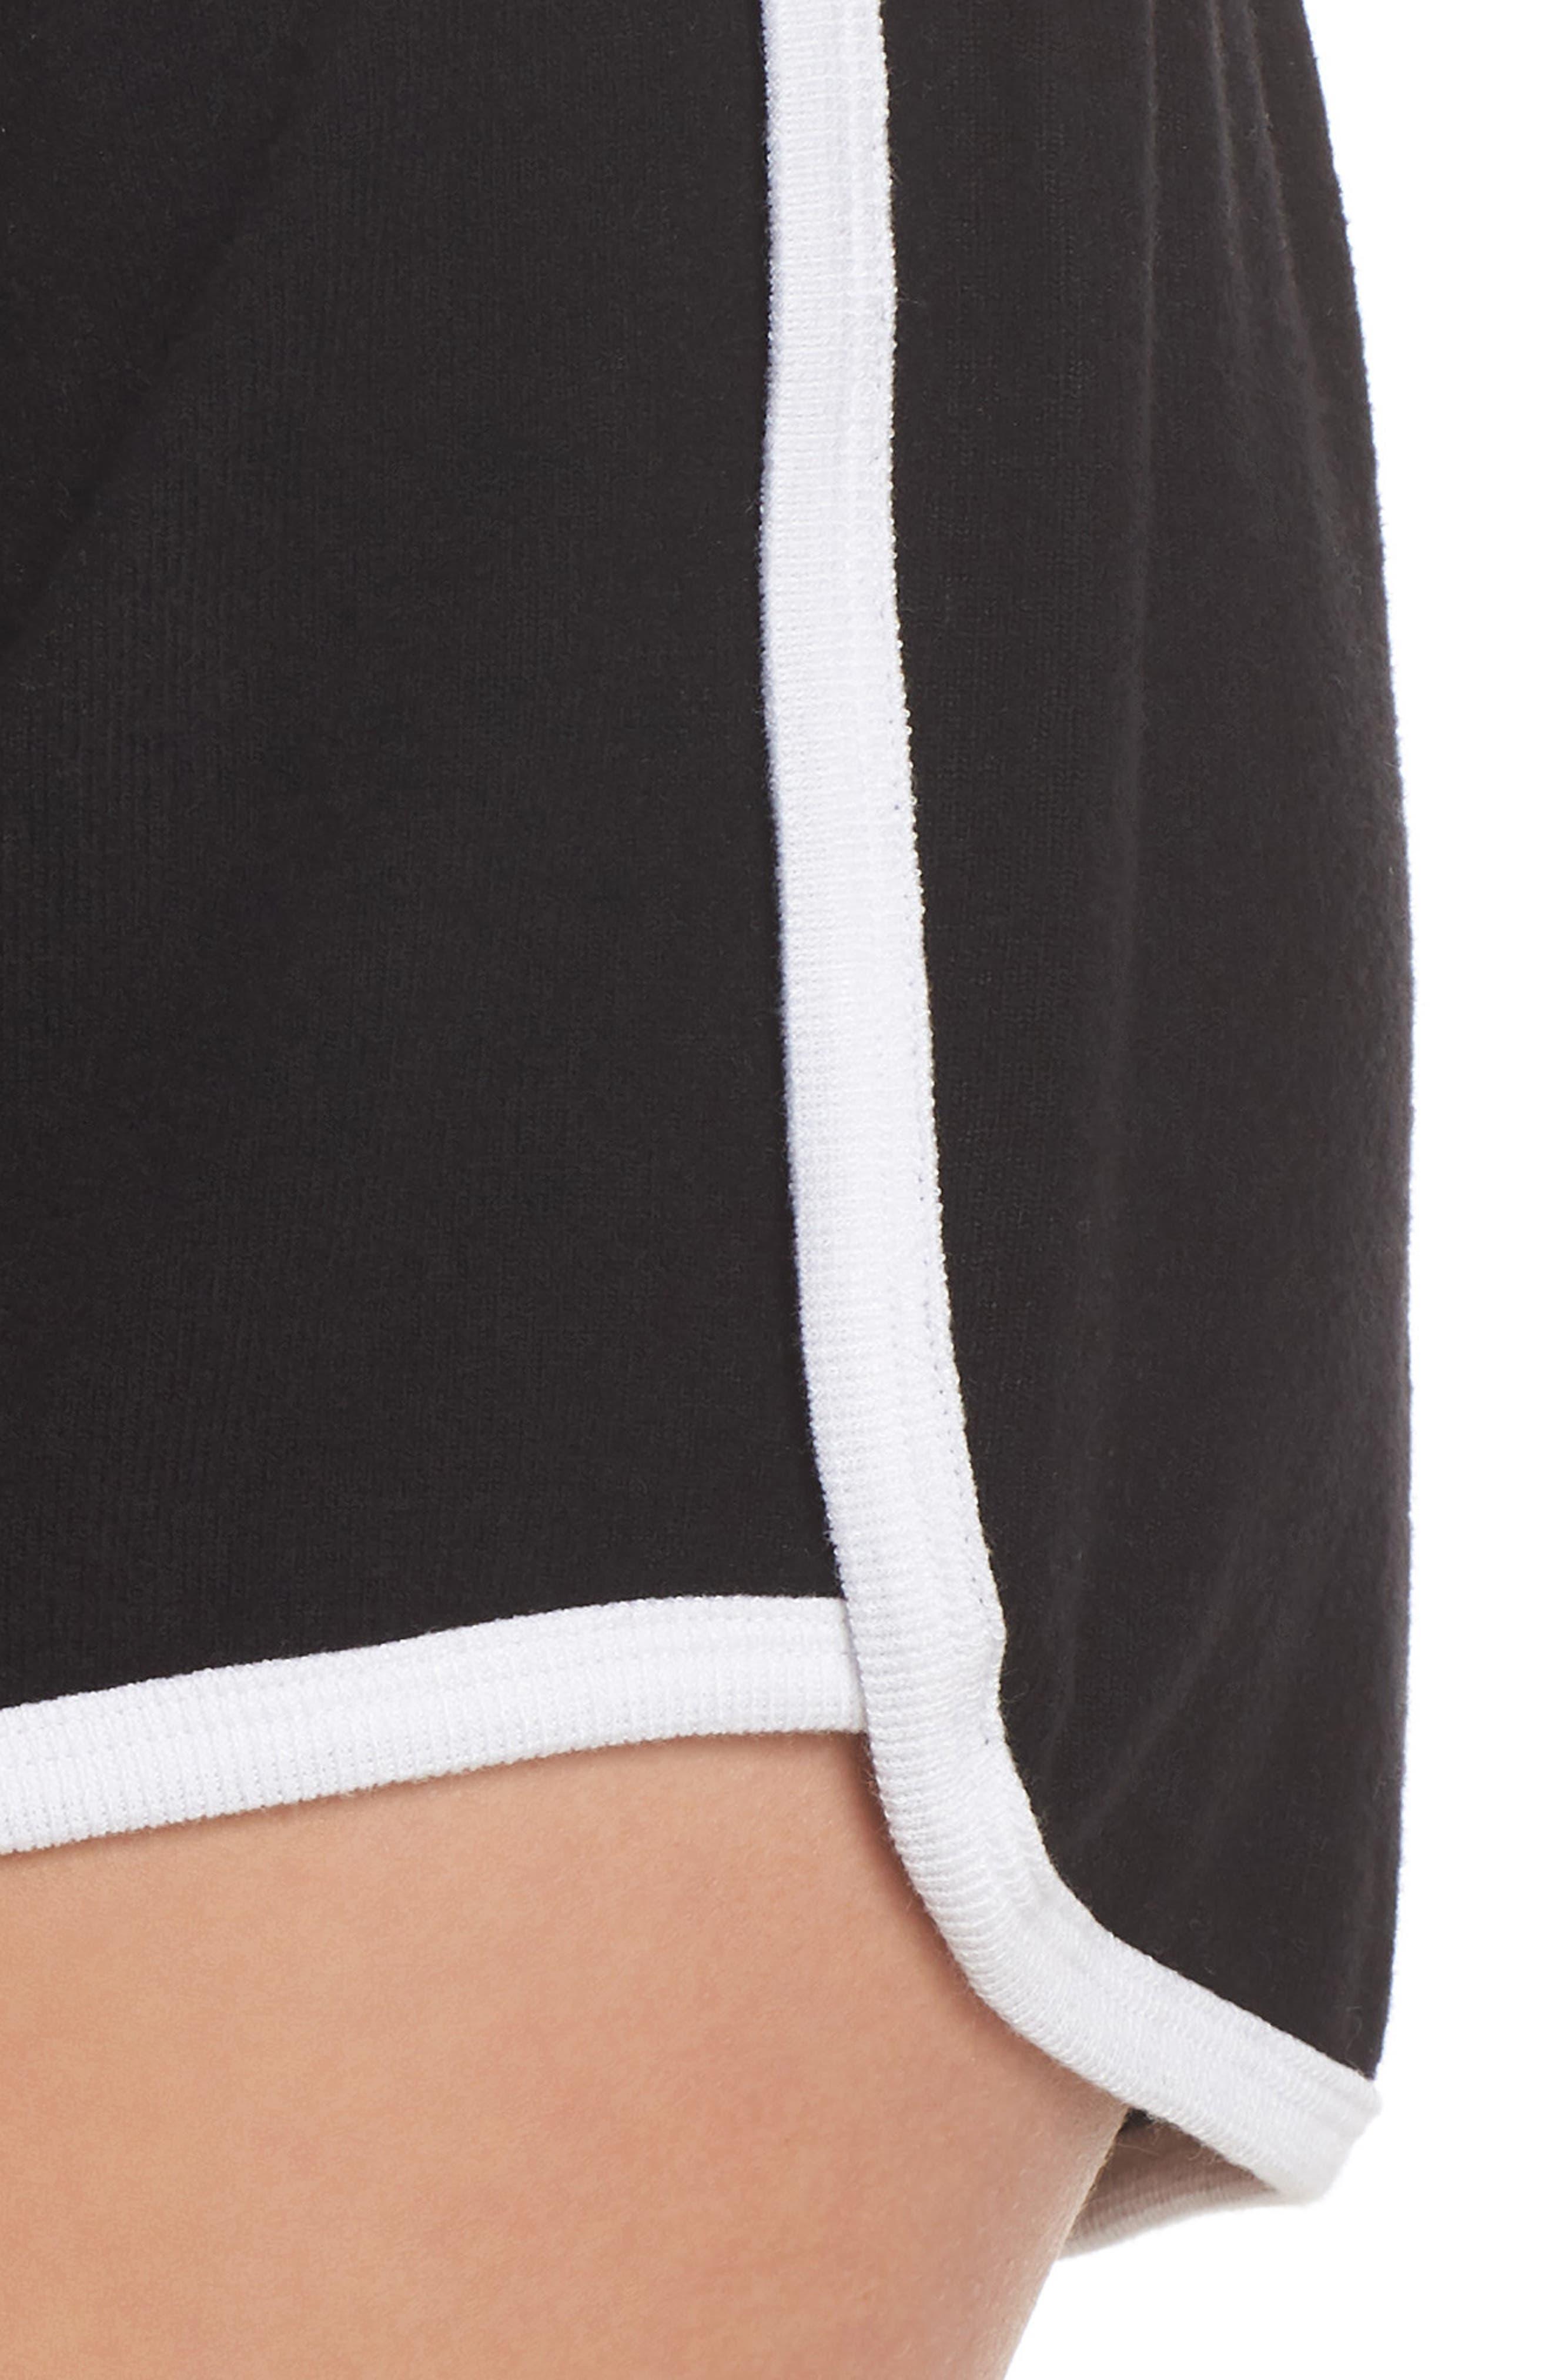 Too Cool Shorts,                             Alternate thumbnail 4, color,                             BLACK